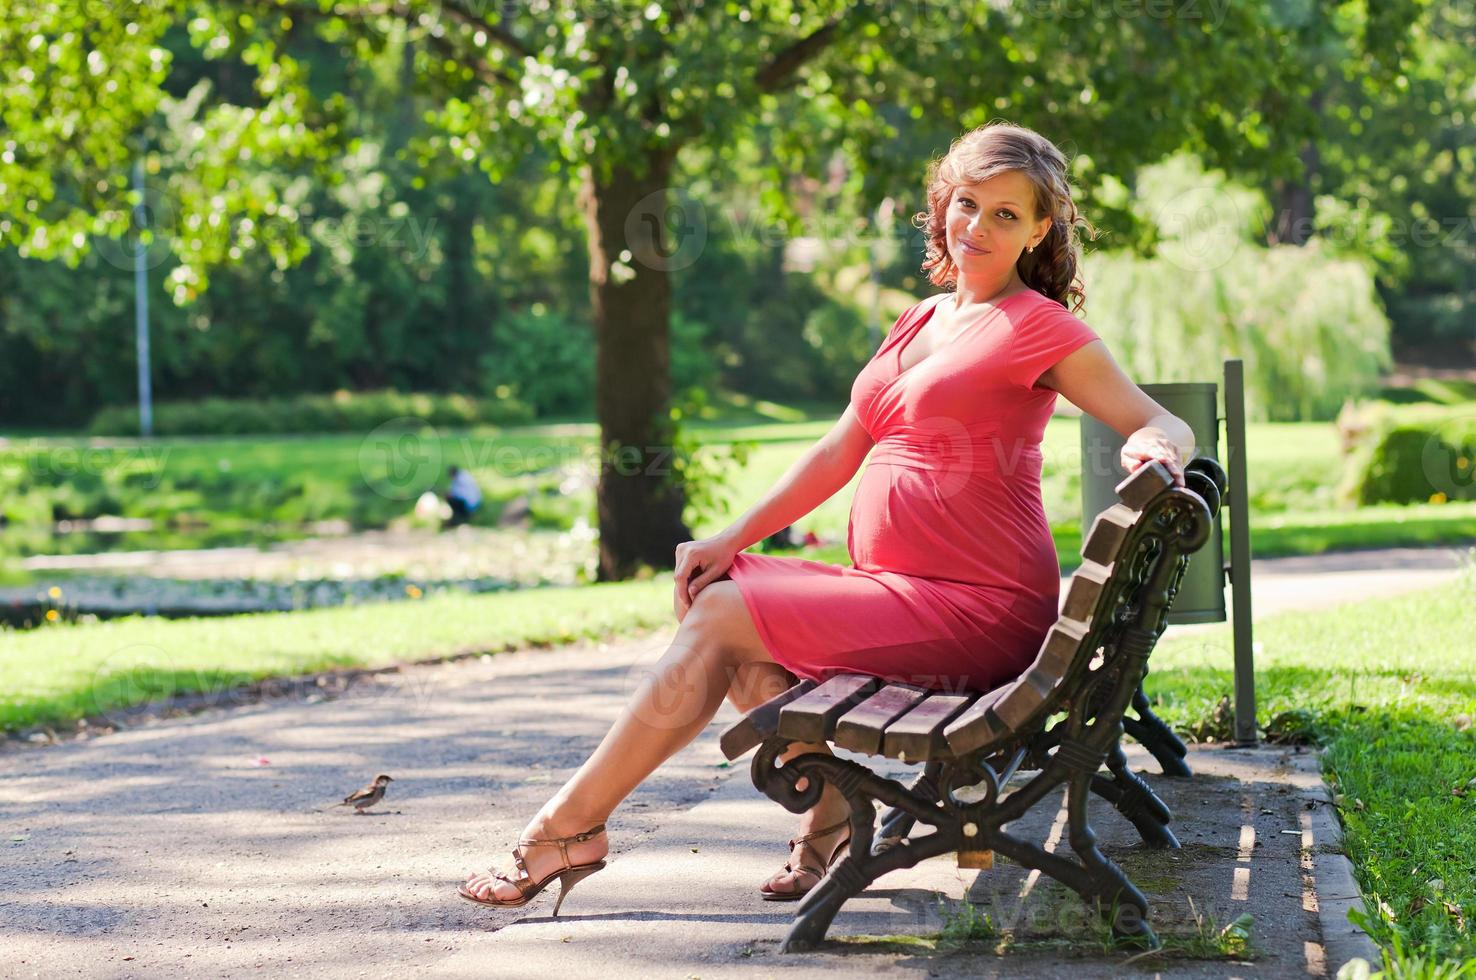 giovane donna incinta nel parco foto